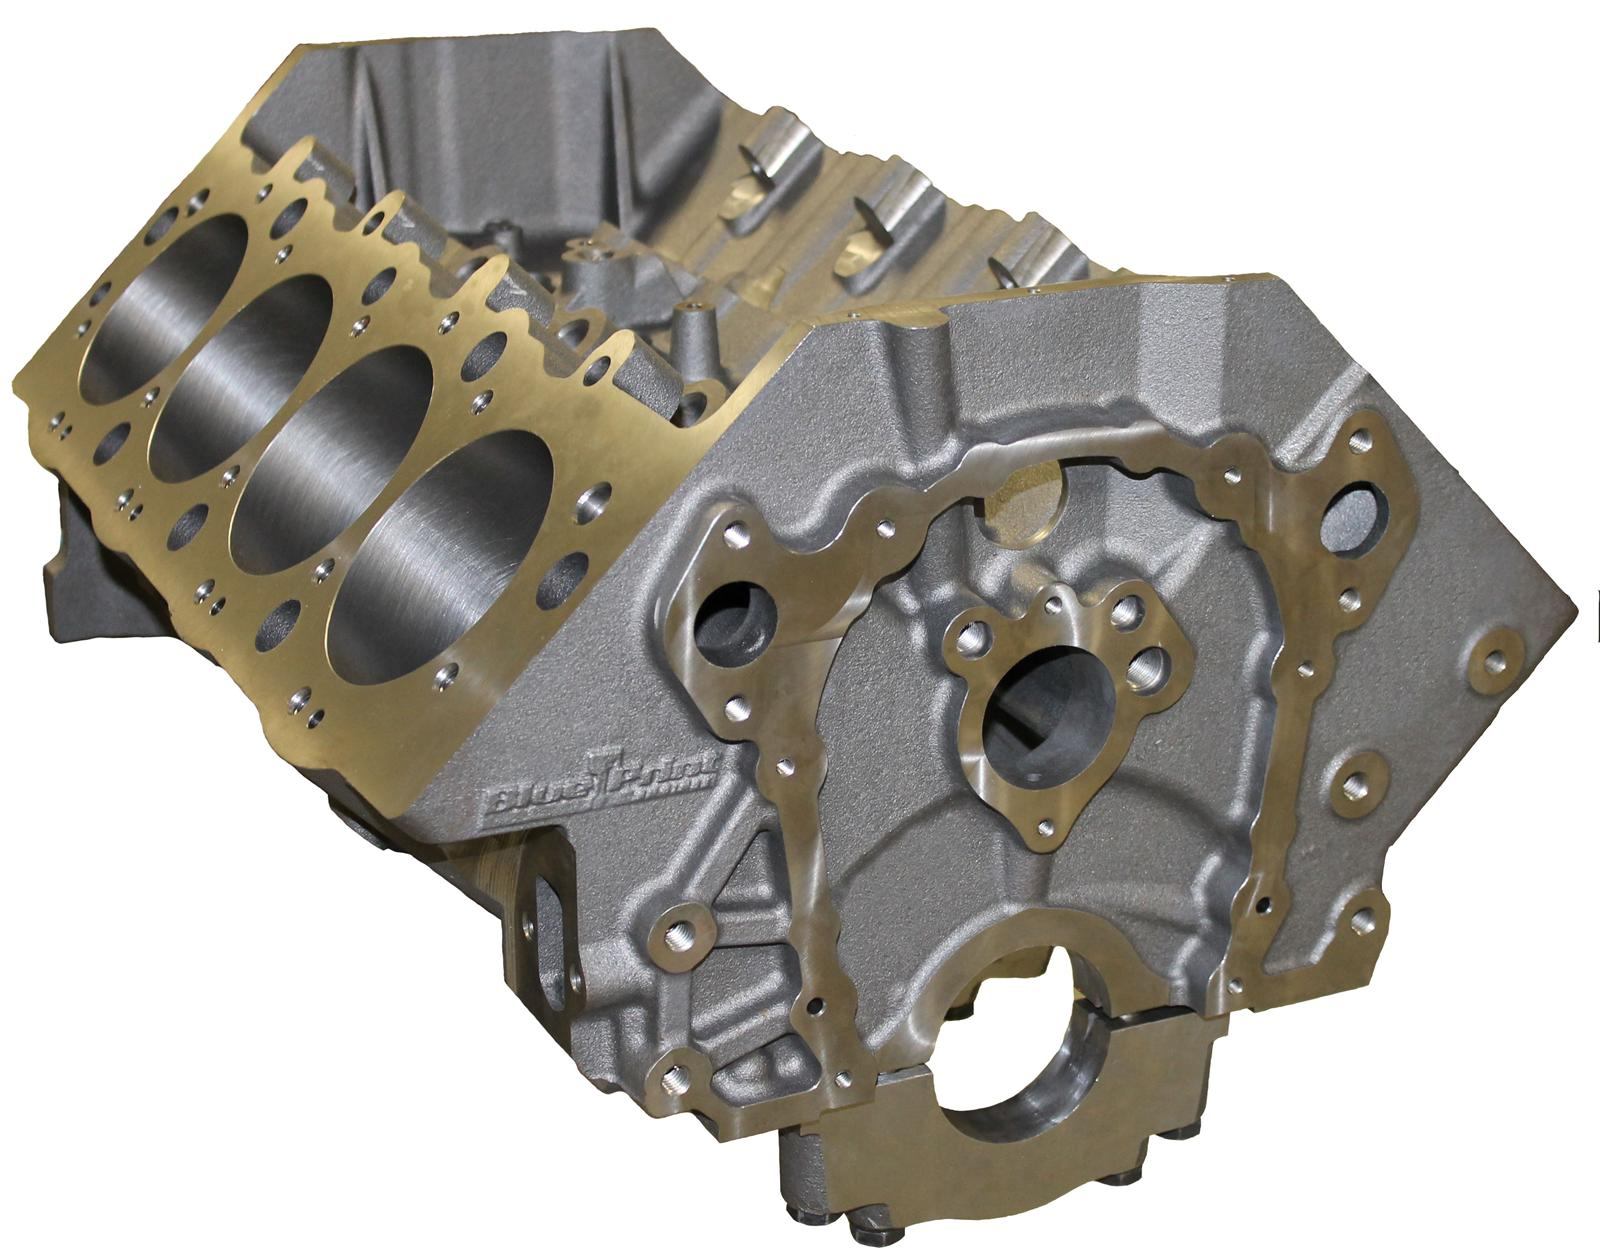 Blueprint engines chevrolet 454 engine block bpt4500100s ebay blueprint engines chevrolet 454 engine block bpt4500100s malvernweather Choice Image